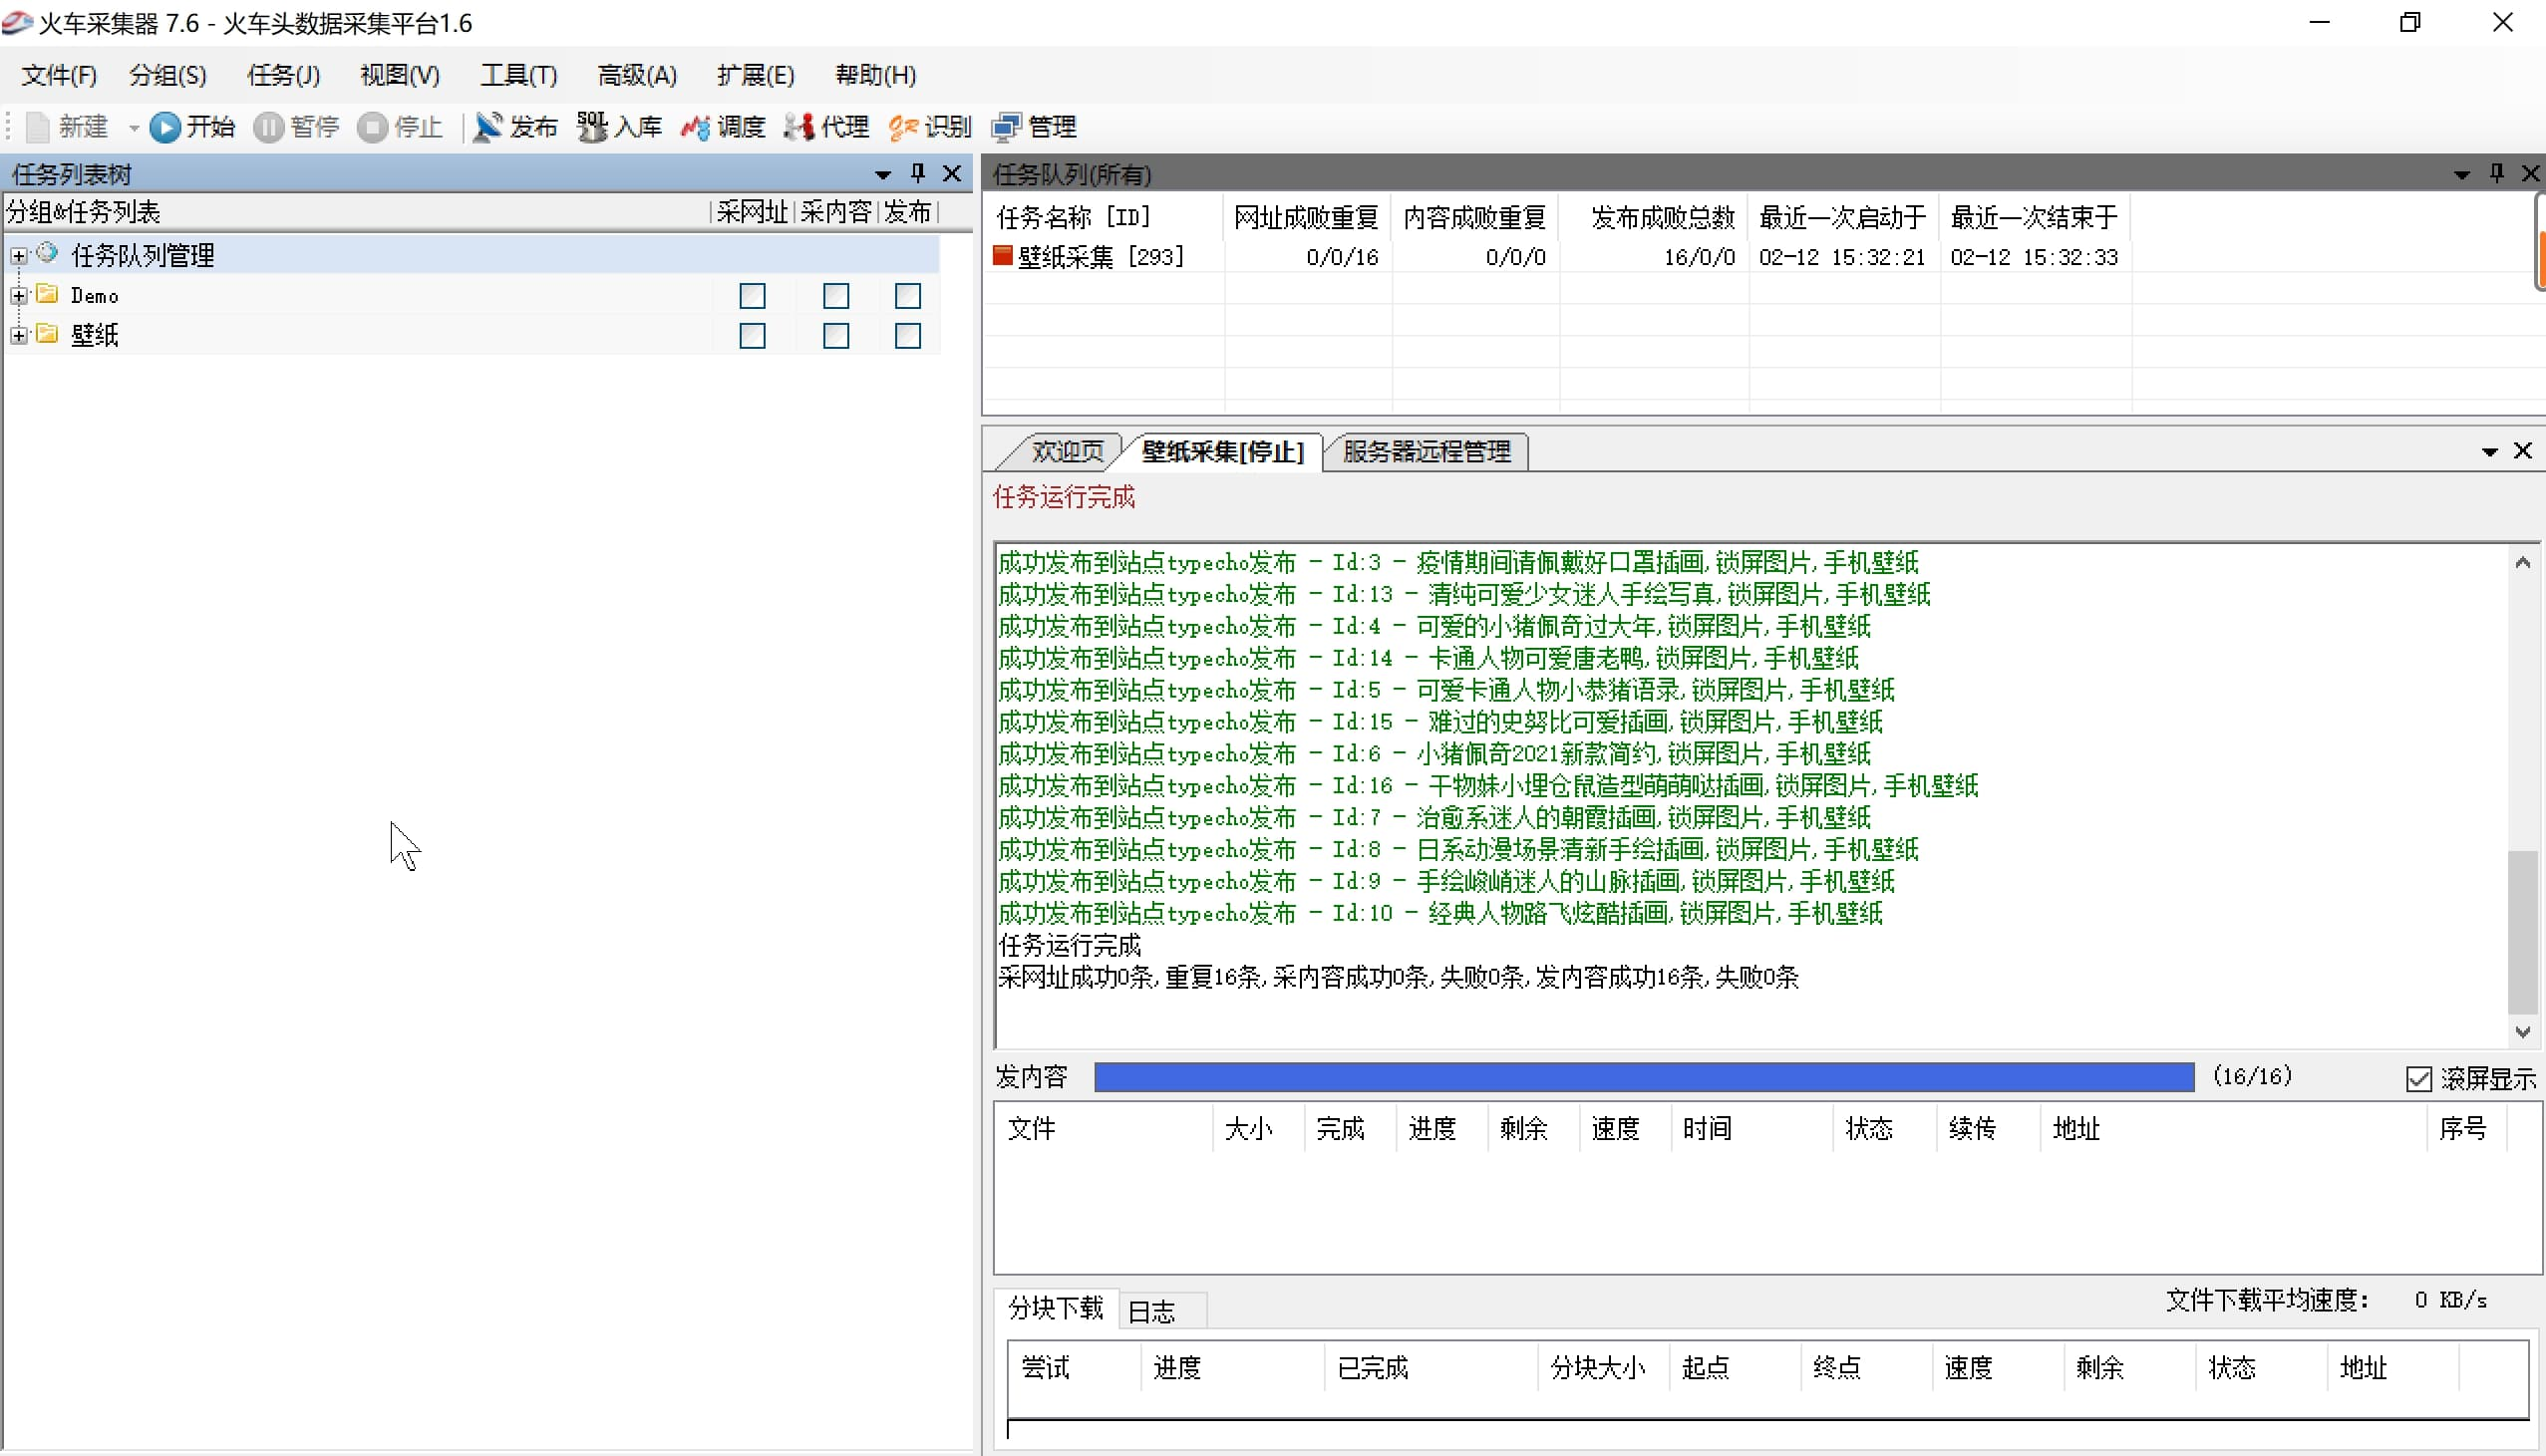 typecho 火车头采集器 7.6 企业旗舰版,赠 配套 typecho发布插件-即刻学术